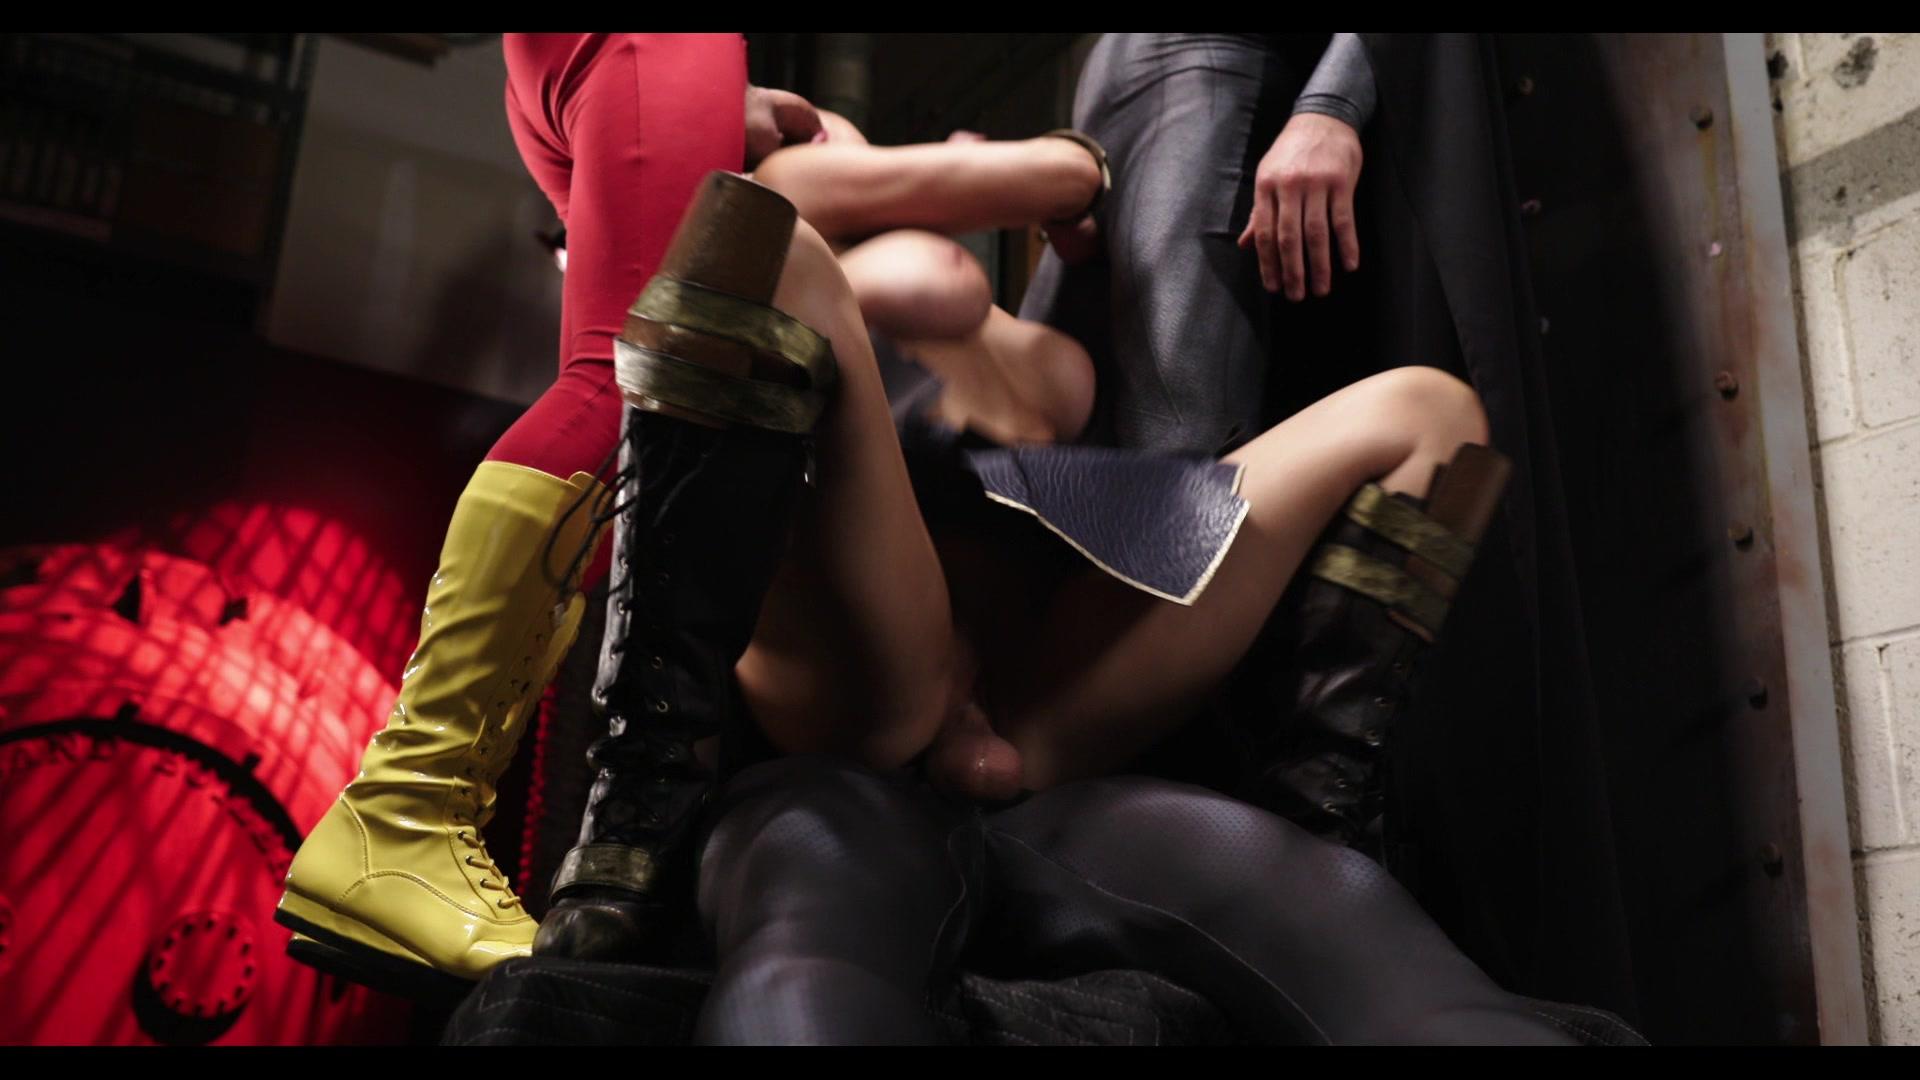 Scene with Xander Corvus, Tyler Nixon and Romi Rain - image 11 out of 20